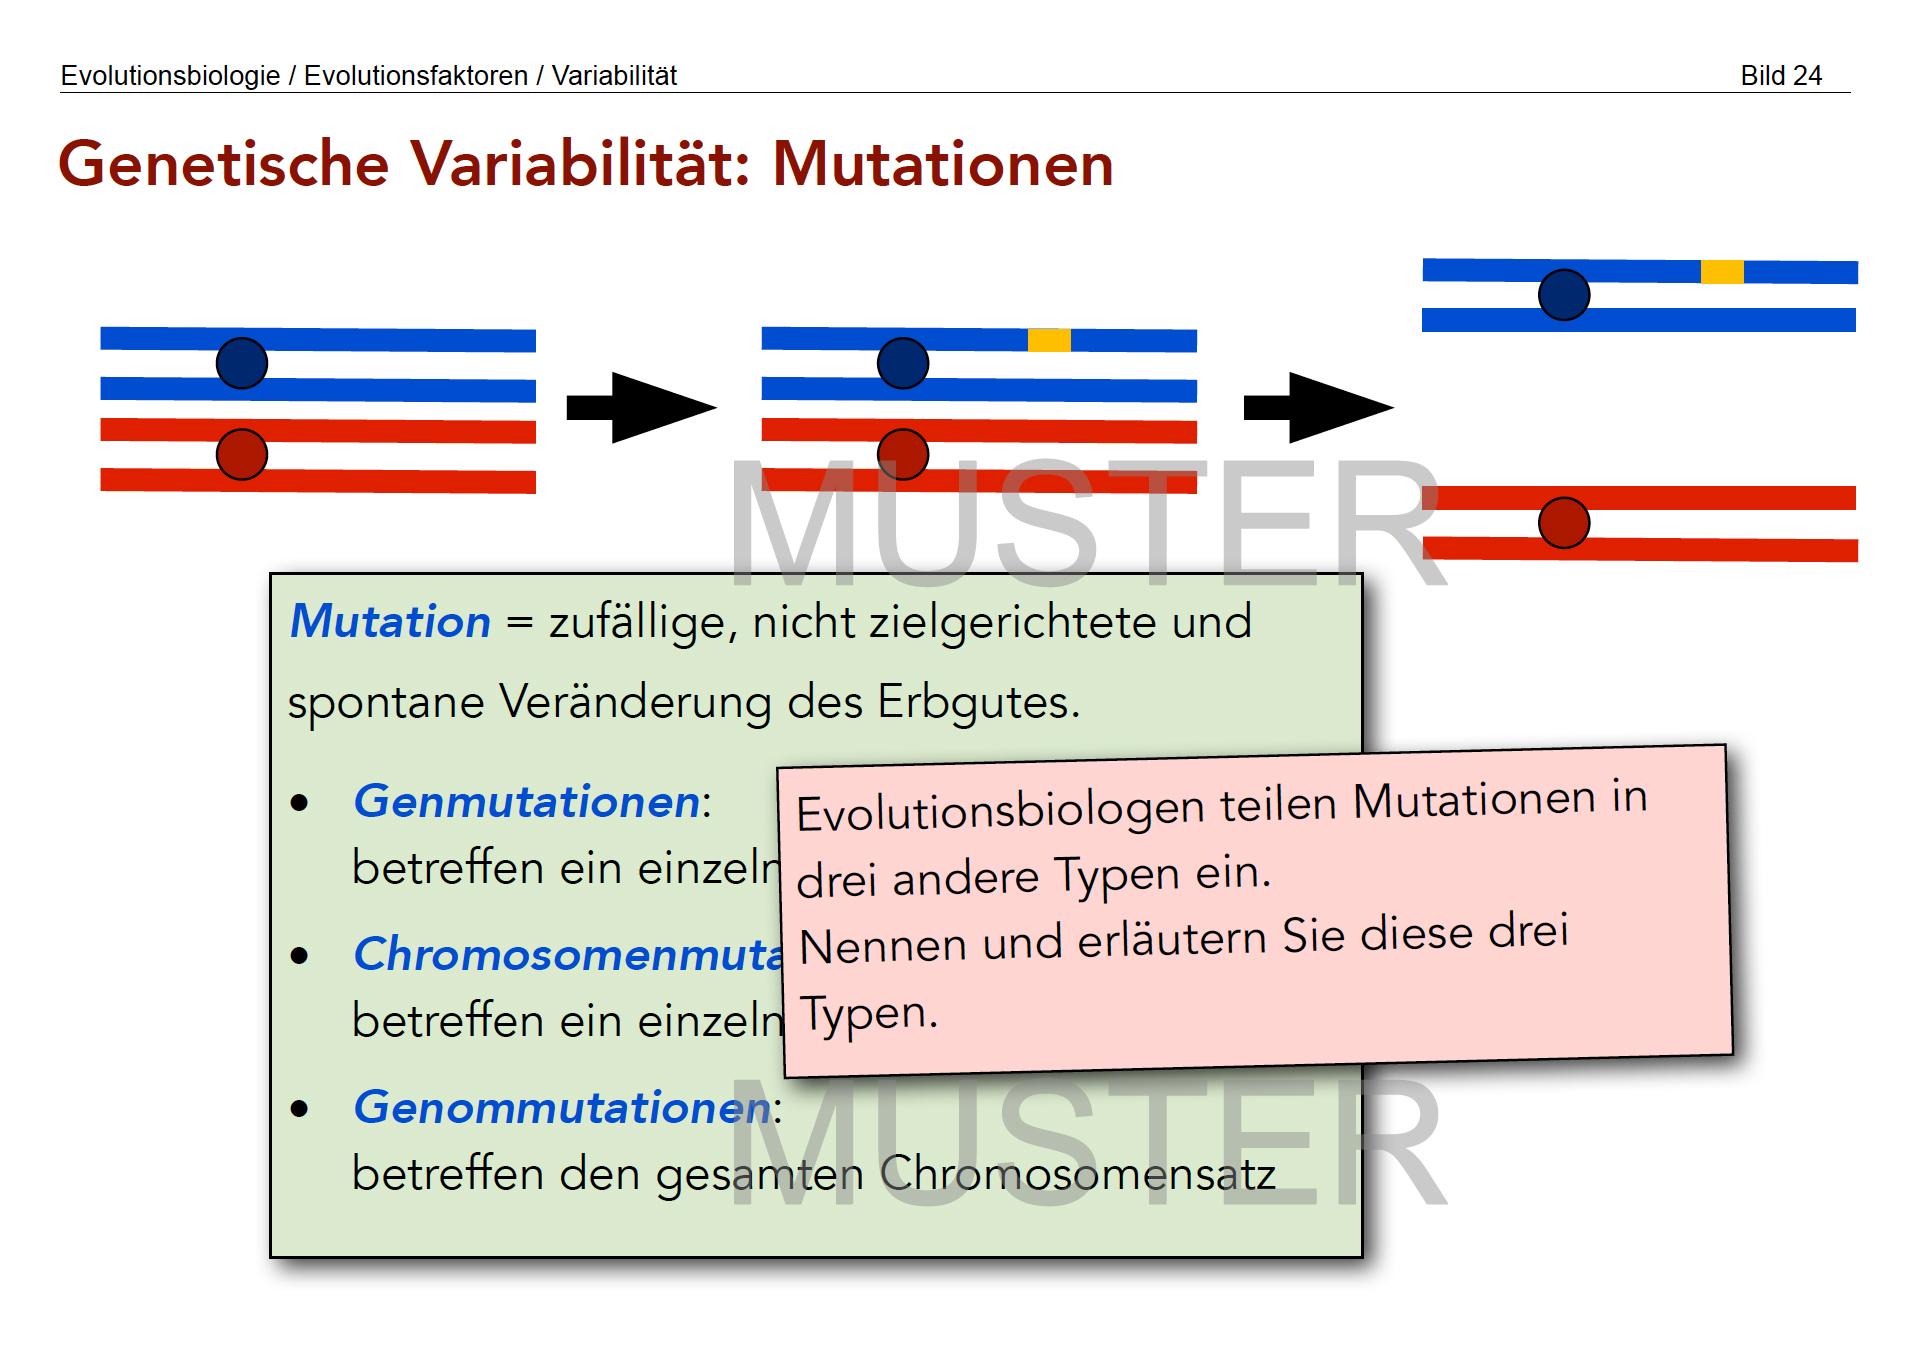 Modifikatorische Variabilität